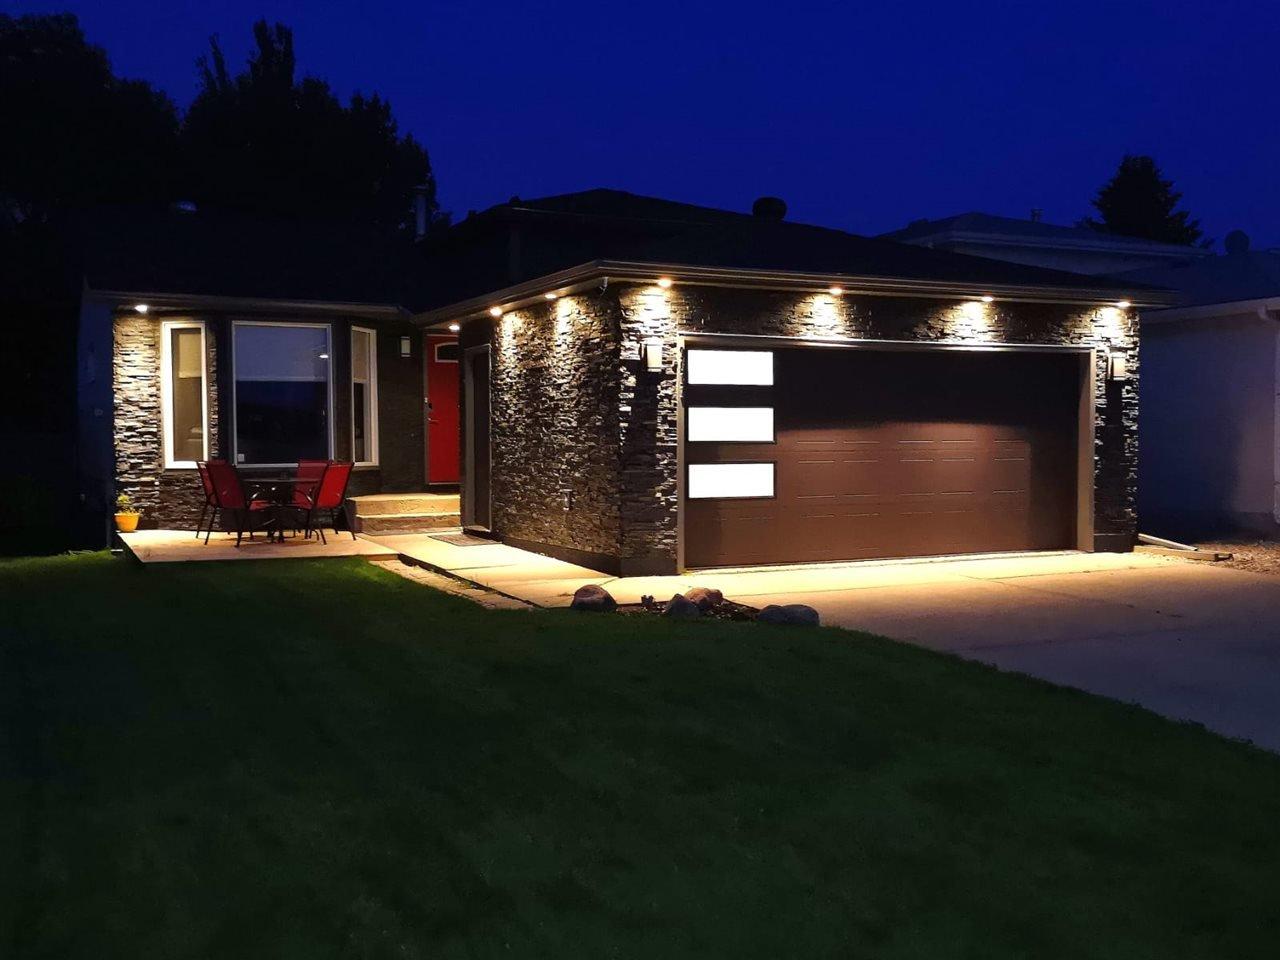 Main Photo: 7011 190B Street in Edmonton: Zone 20 House for sale : MLS®# E4169981